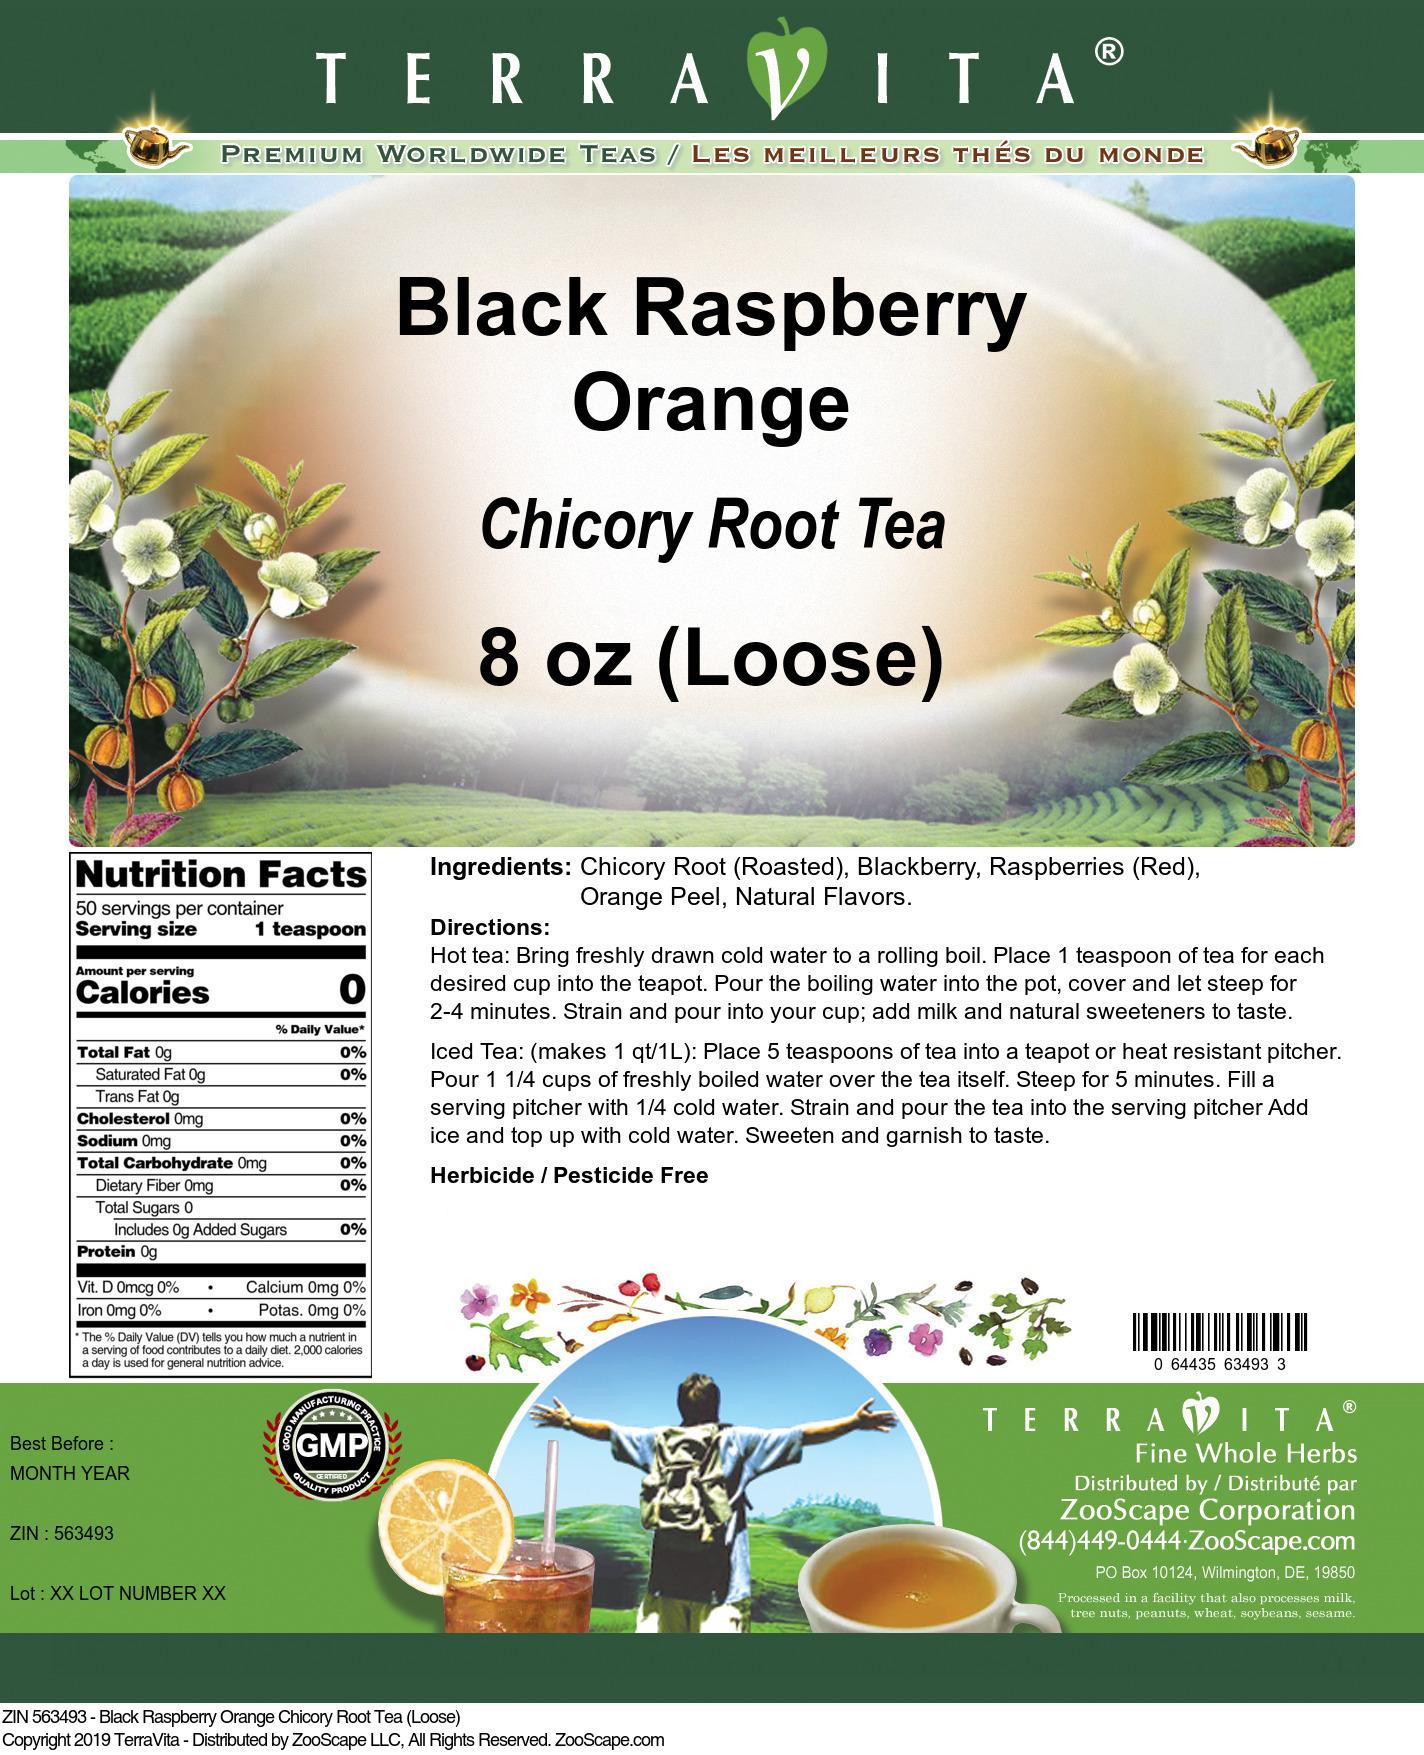 Black Raspberry Orange Chicory Root Tea (Loose)